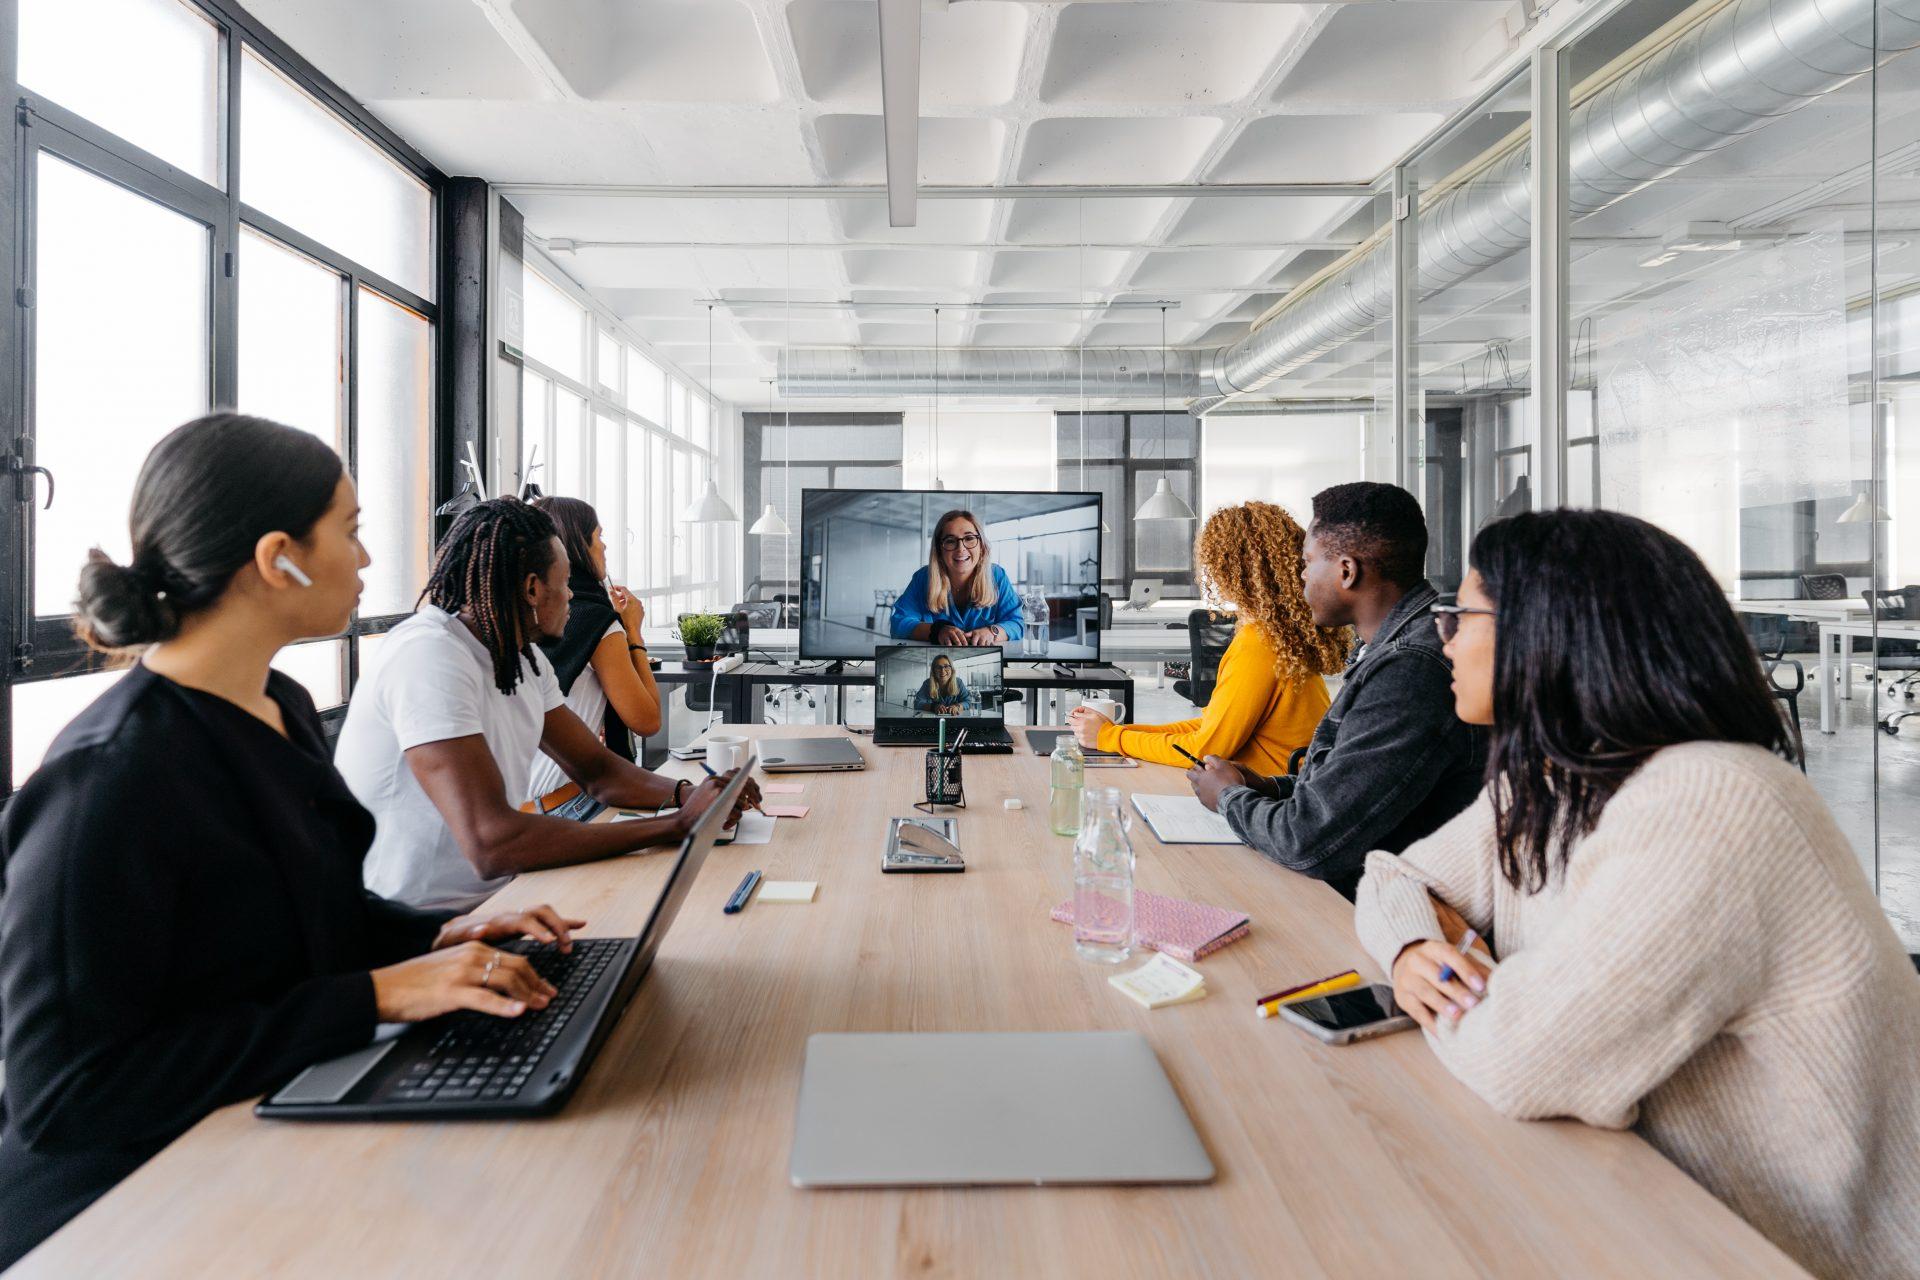 sala-indautxu-biworking-coworking-bilbao-reuniones-innovación-empresas